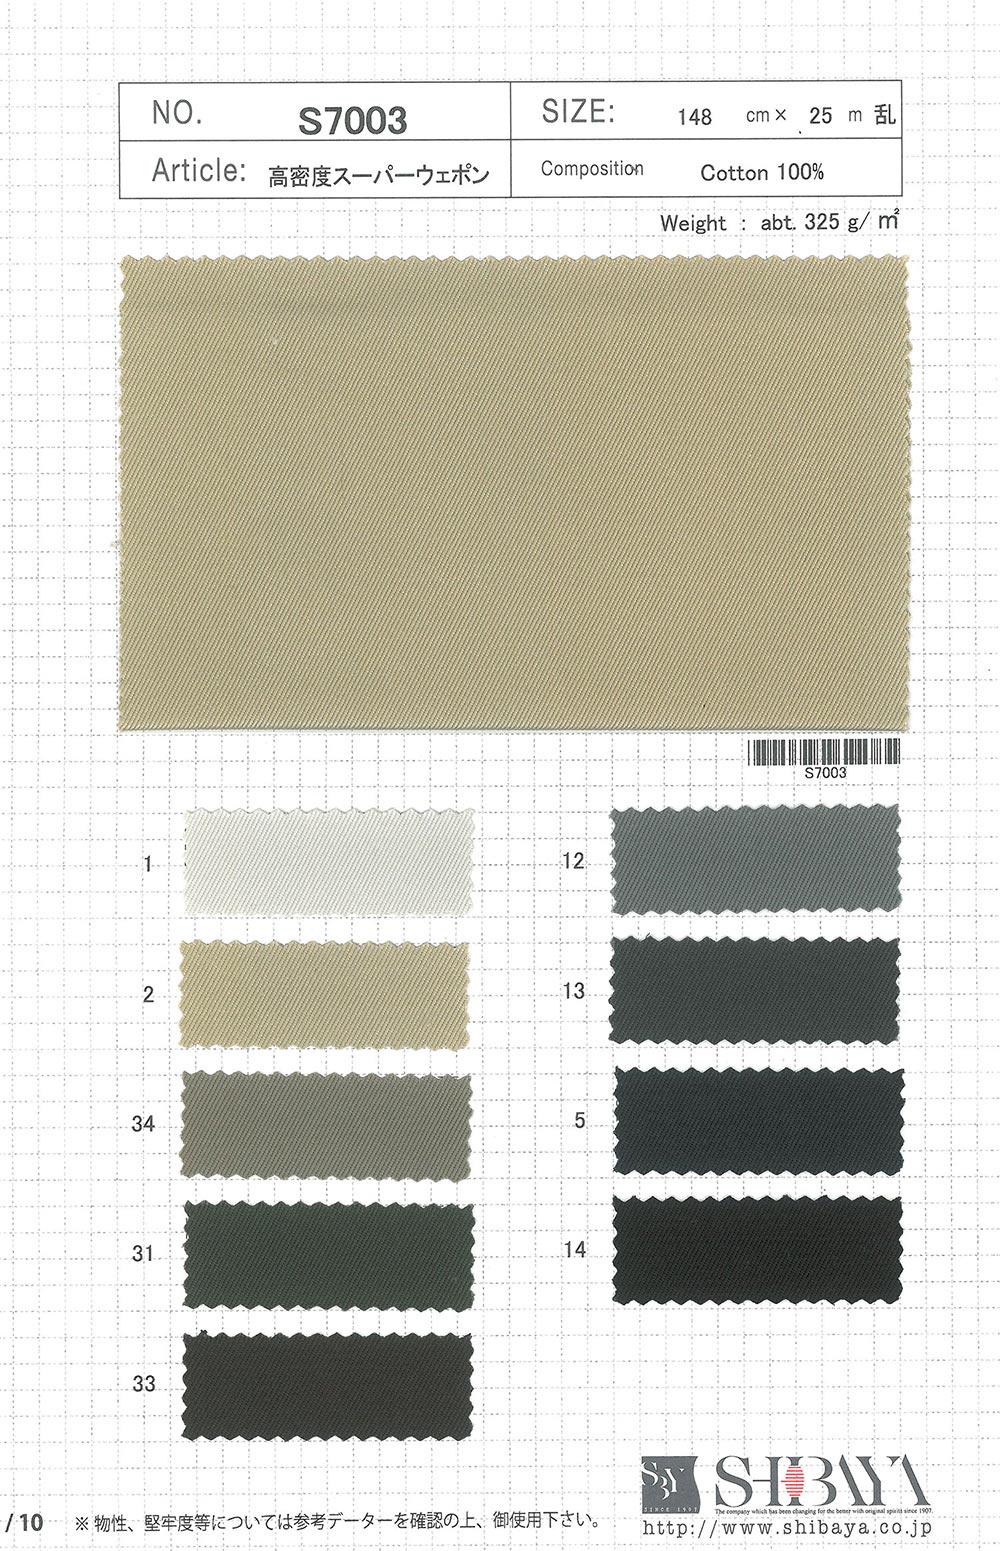 S7003 高密度スーパーウェポン[生地] 柴屋/オークラ商事 - ApparelX アパレル資材卸通販